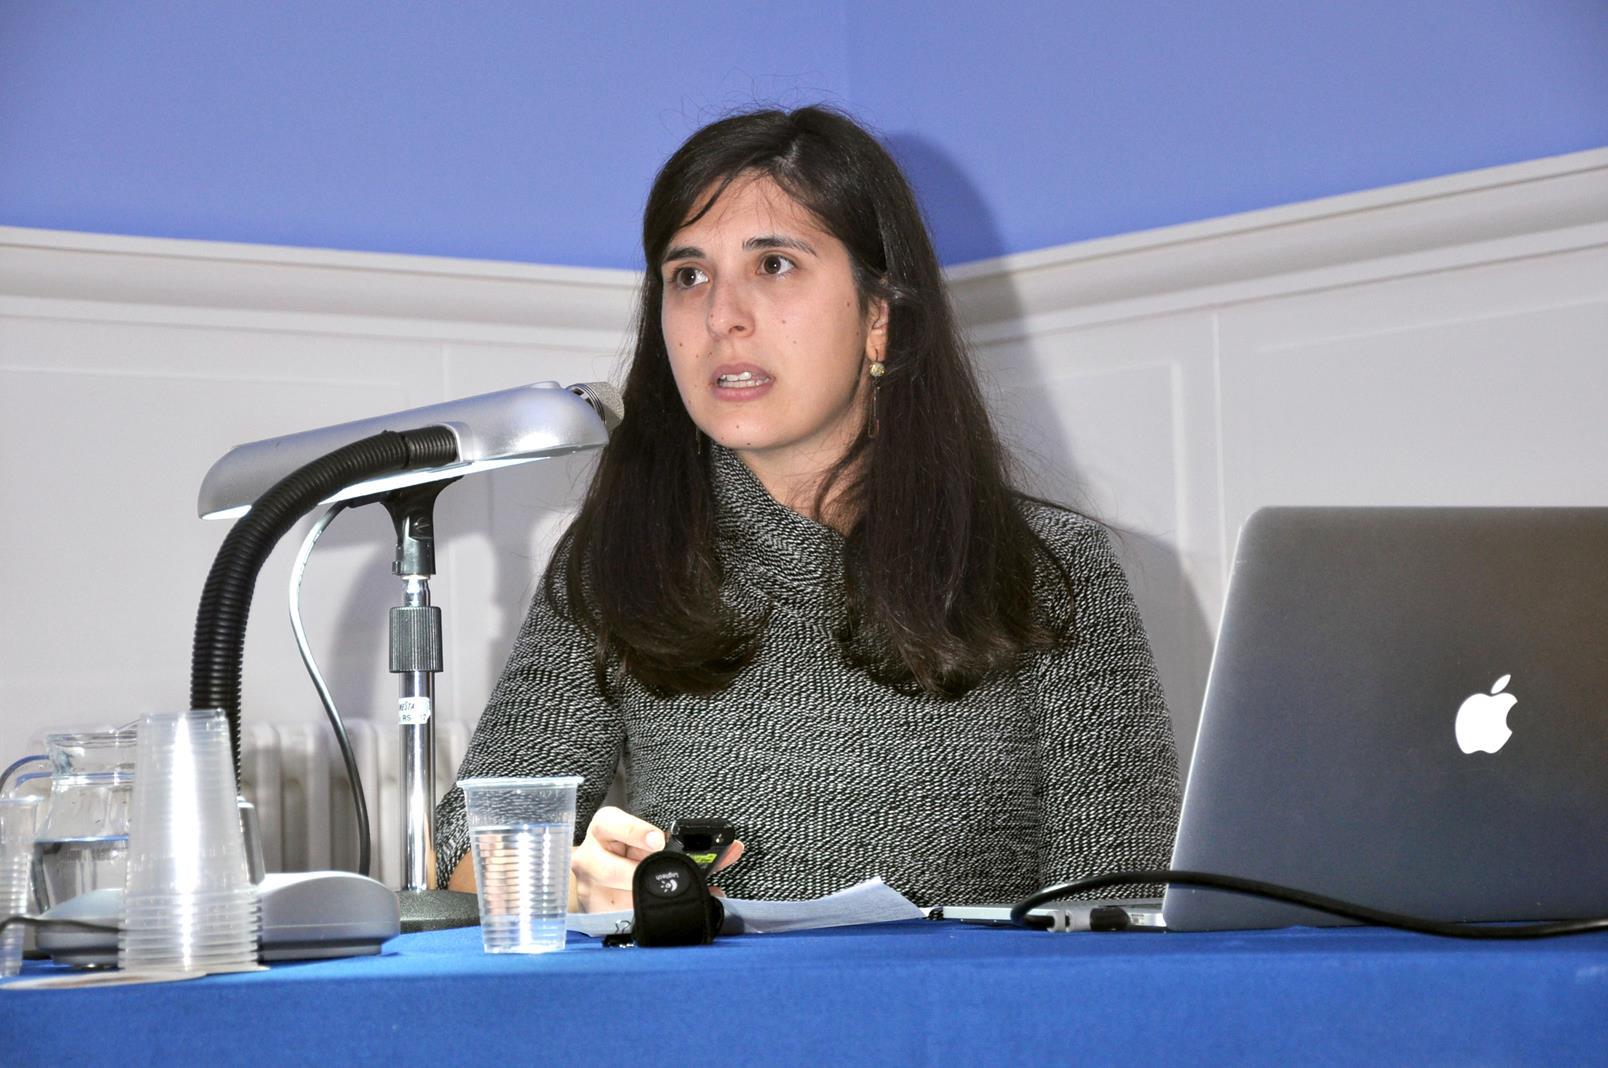 Sara Brancato. Restauradora, UCM, Madrid. 25/10/19